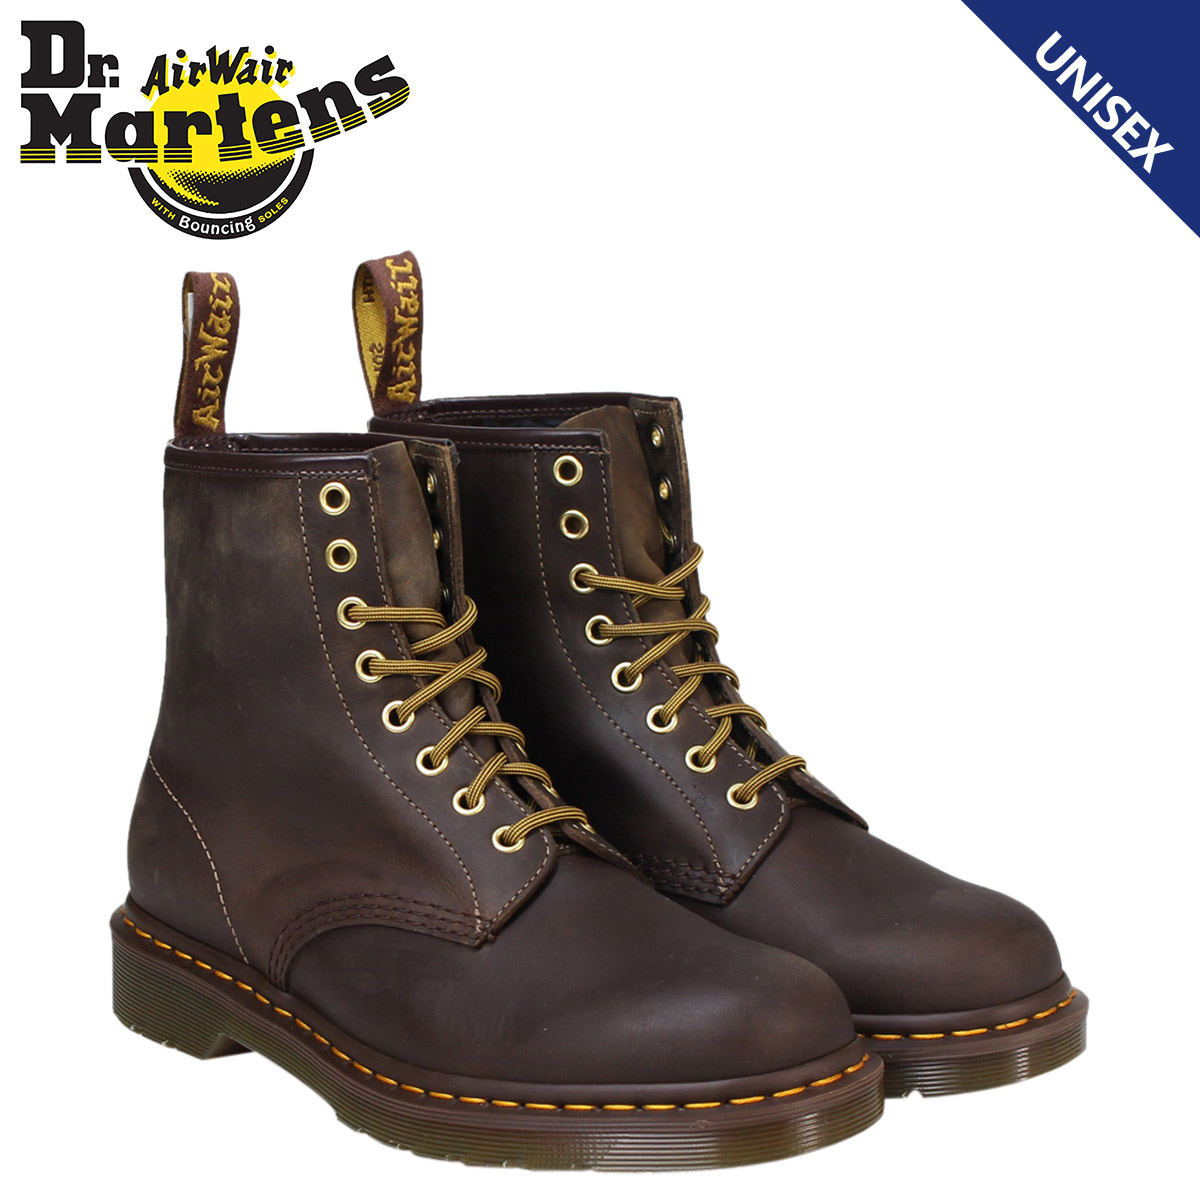 Dr.Martens ドクターマーチン 1460 8ホール ブーツ 8 EYE BOOT R11822200 メンズ レディース